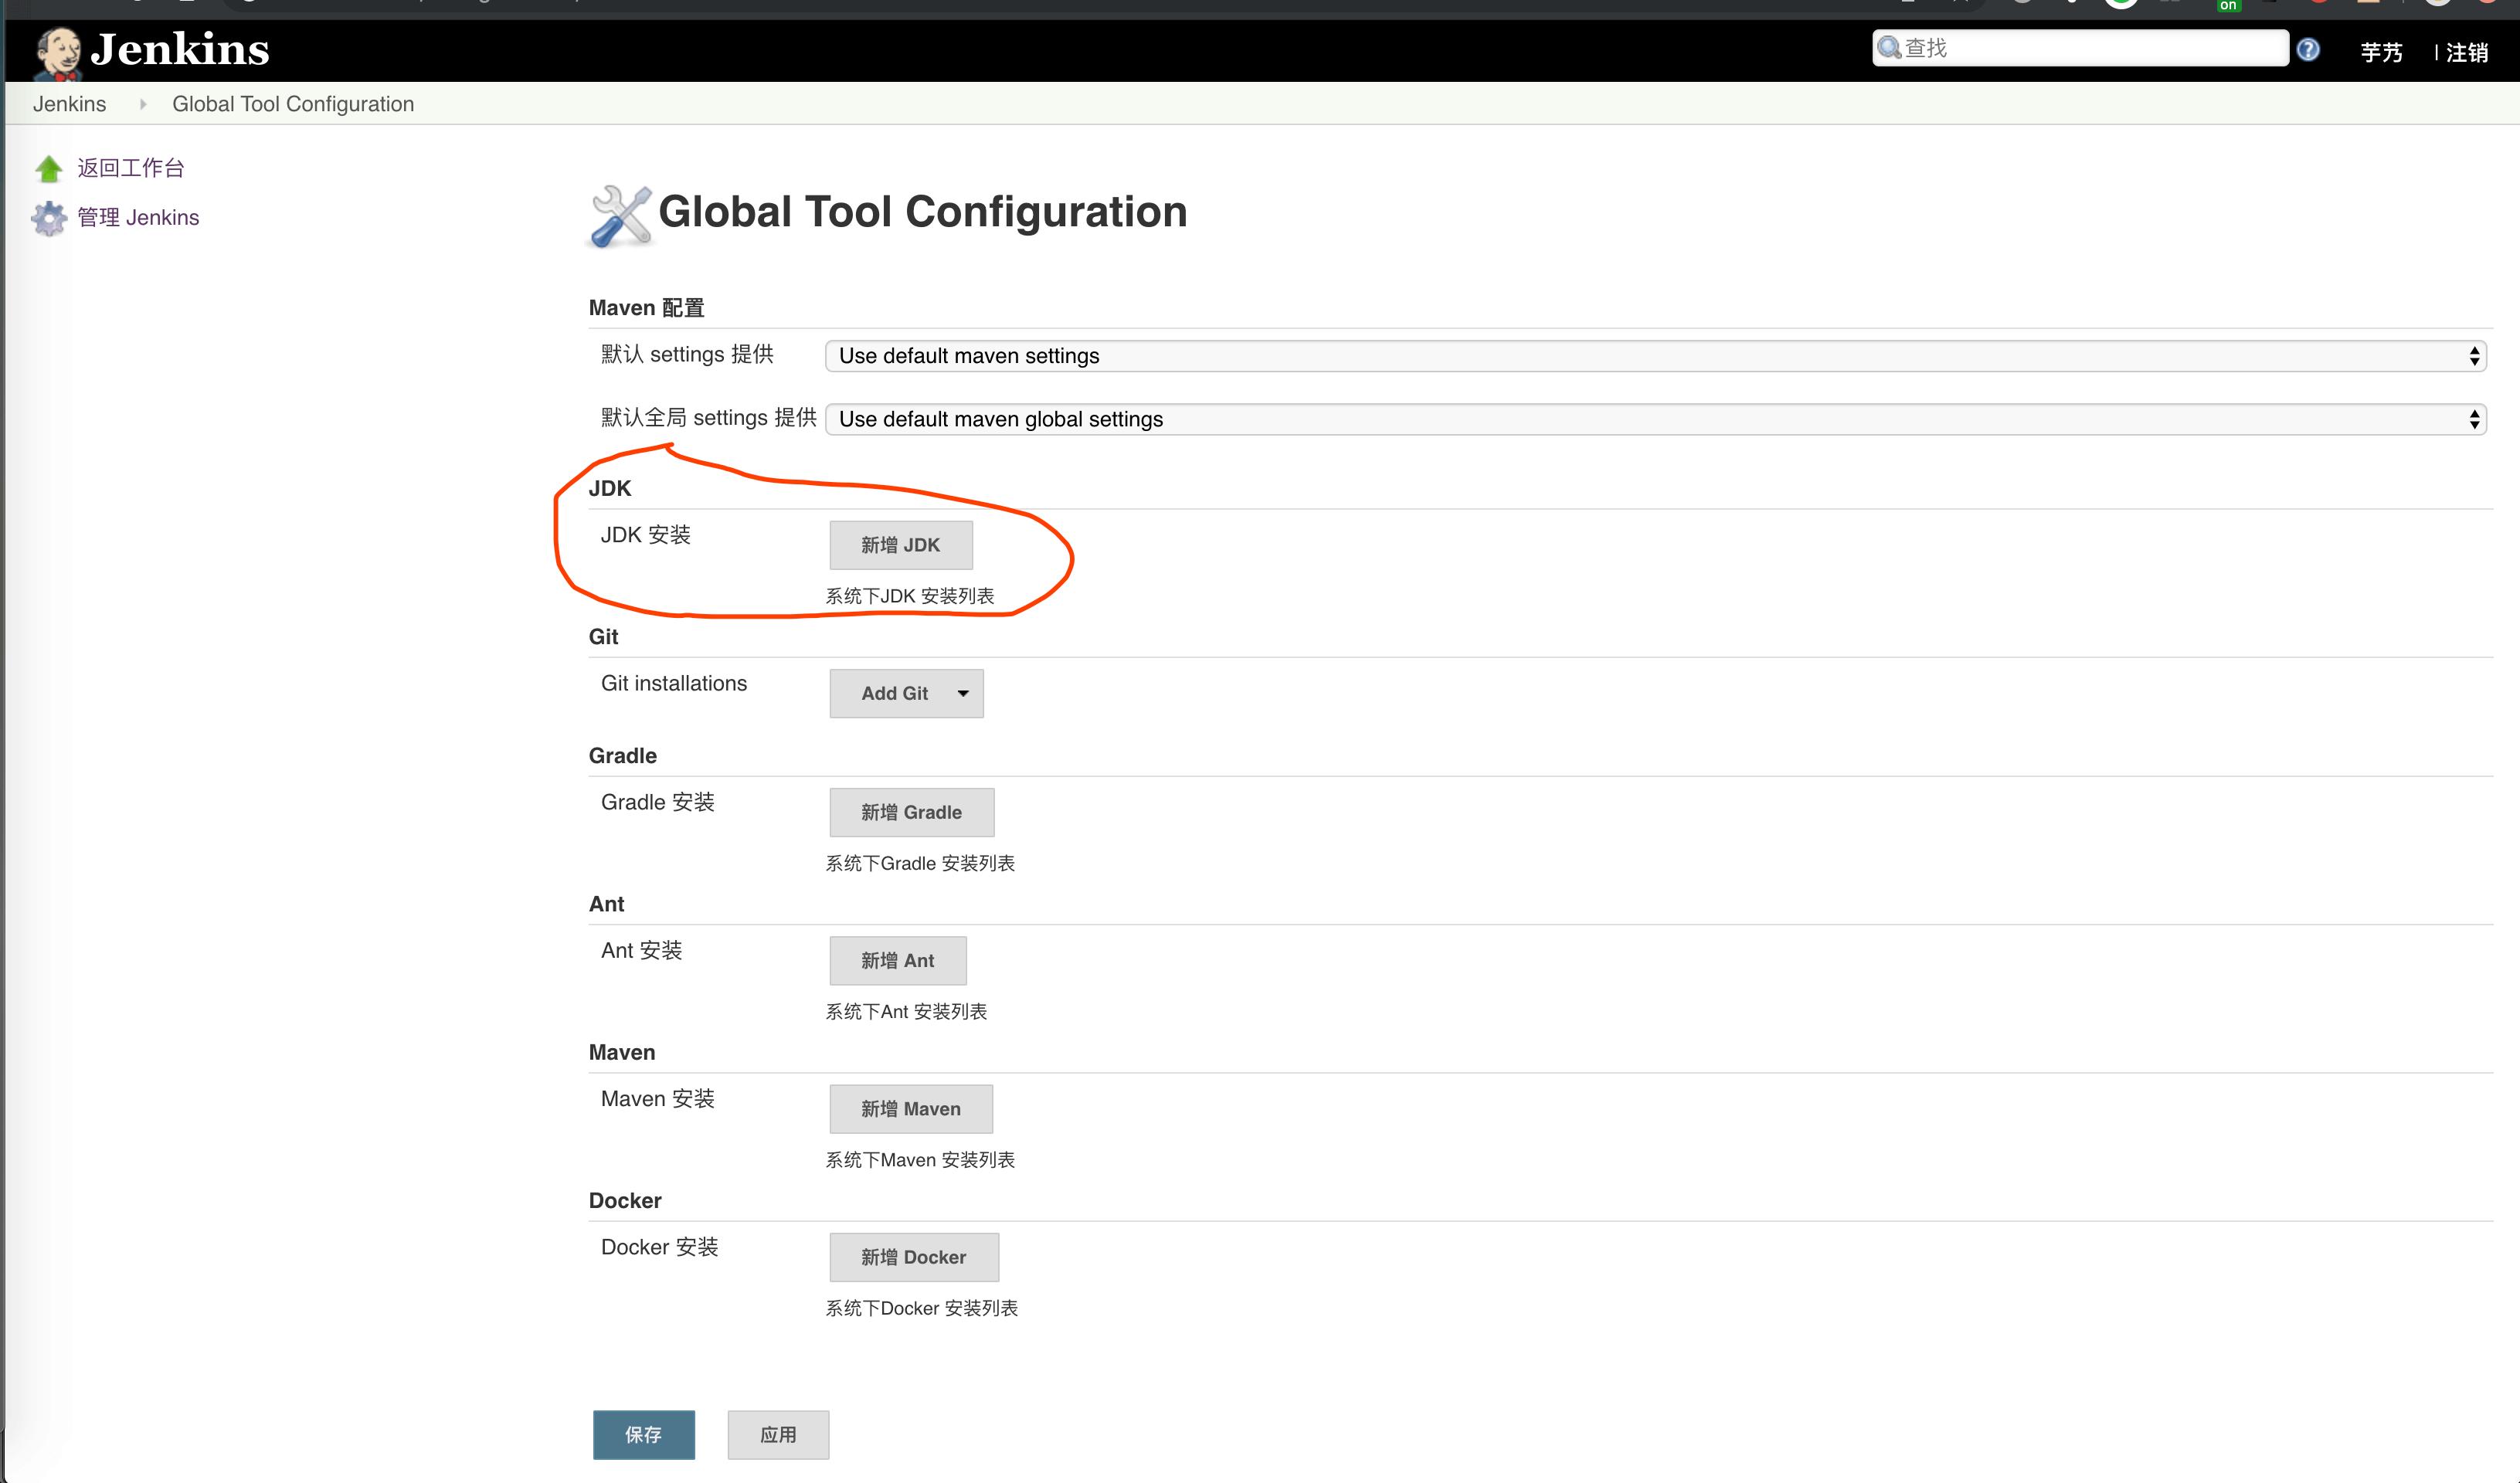 Global Tool Configuration